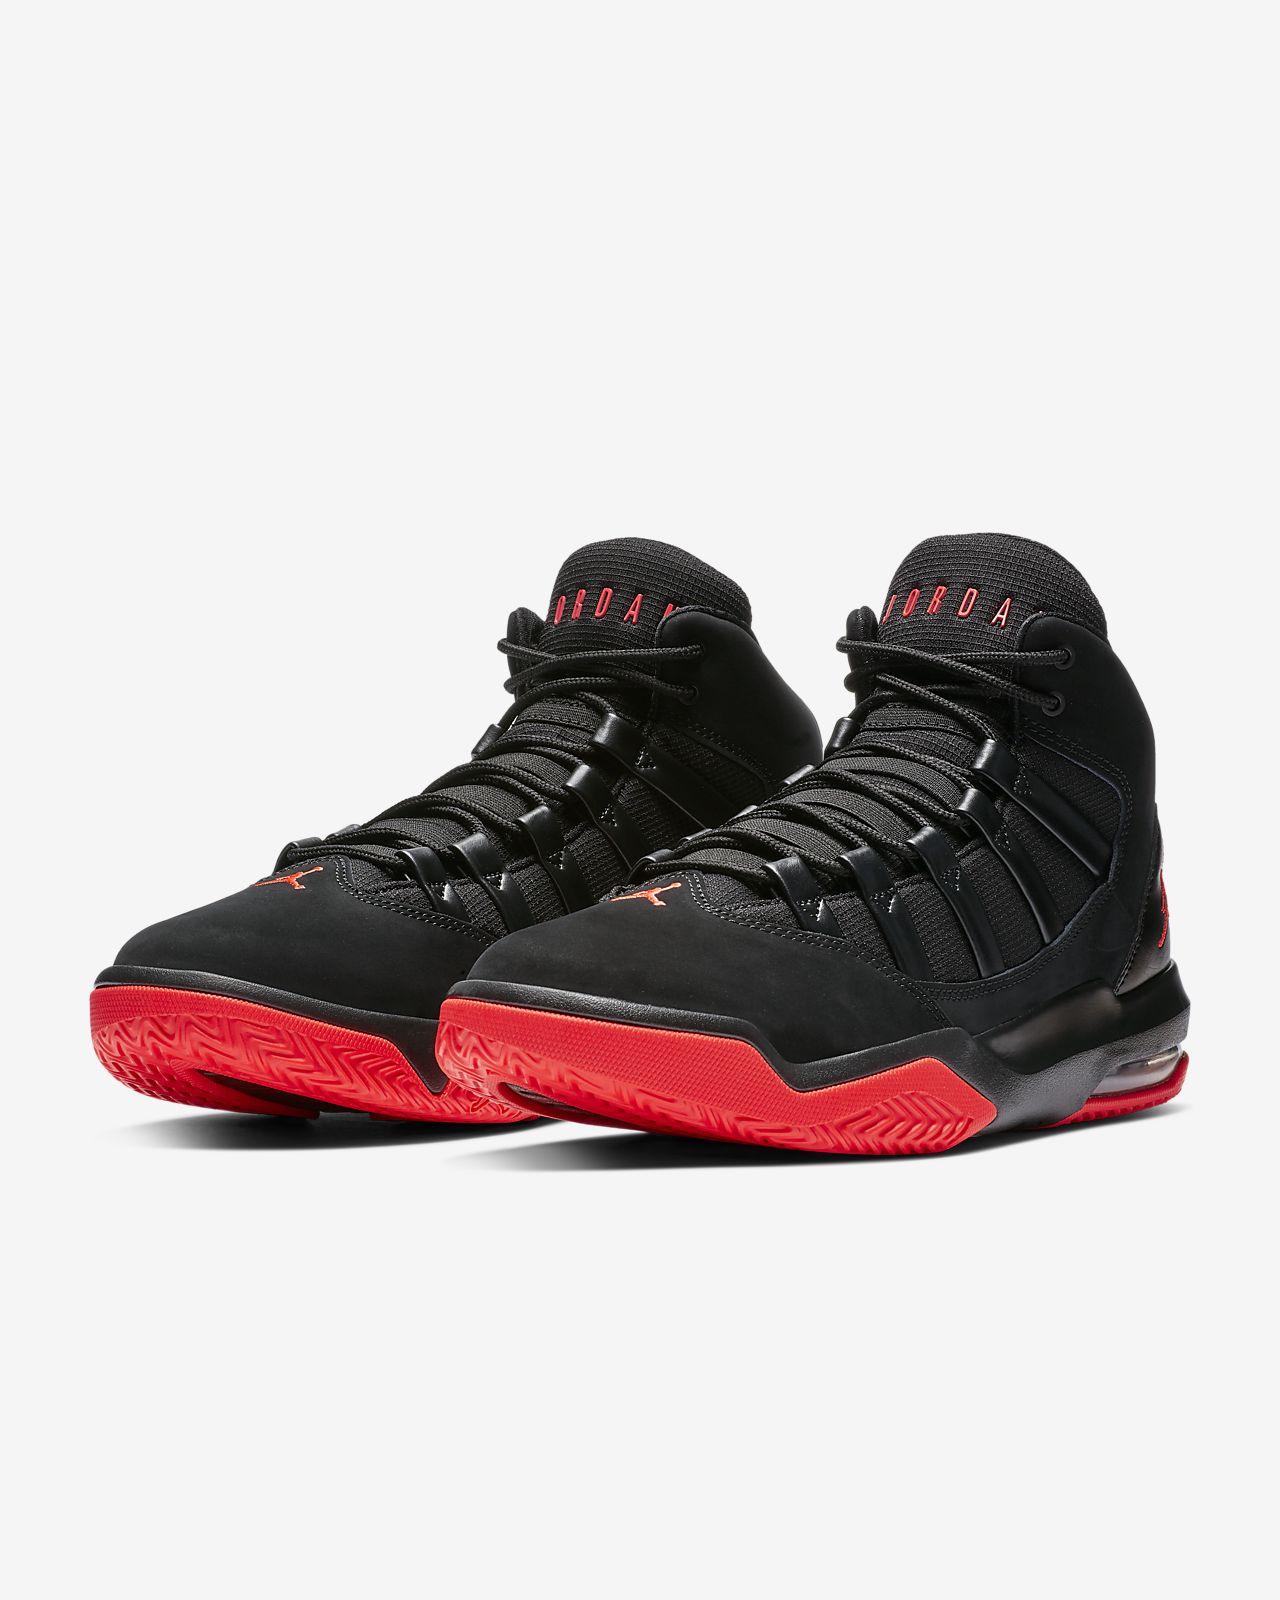 4ad3ffad3b30 Jordan Max Aura Men s Basketball Shoe. Nike.com